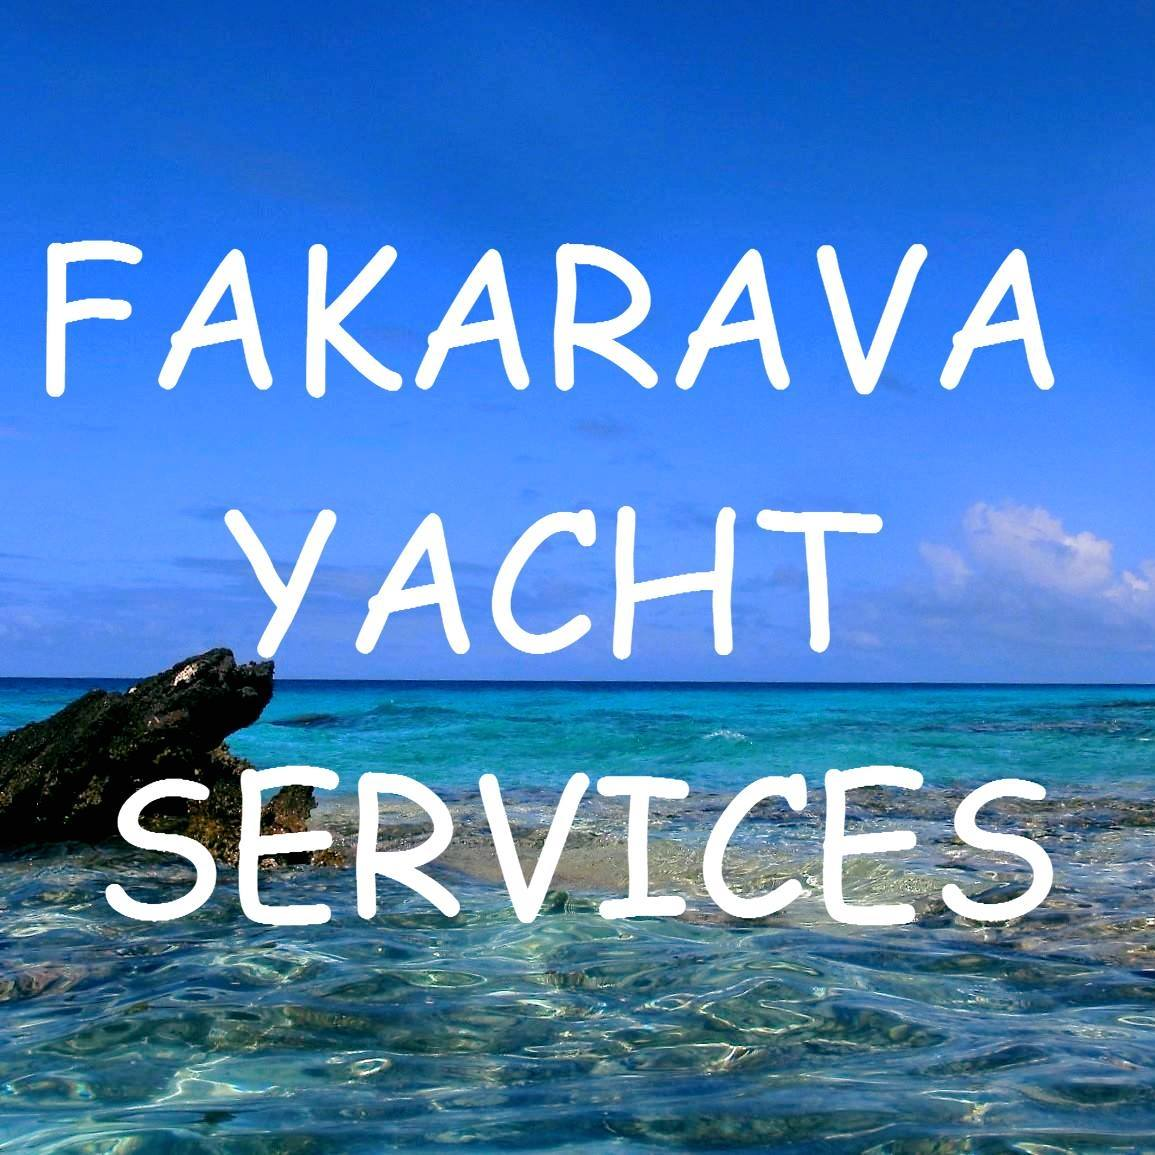 fakarava Yacht Services.jpg